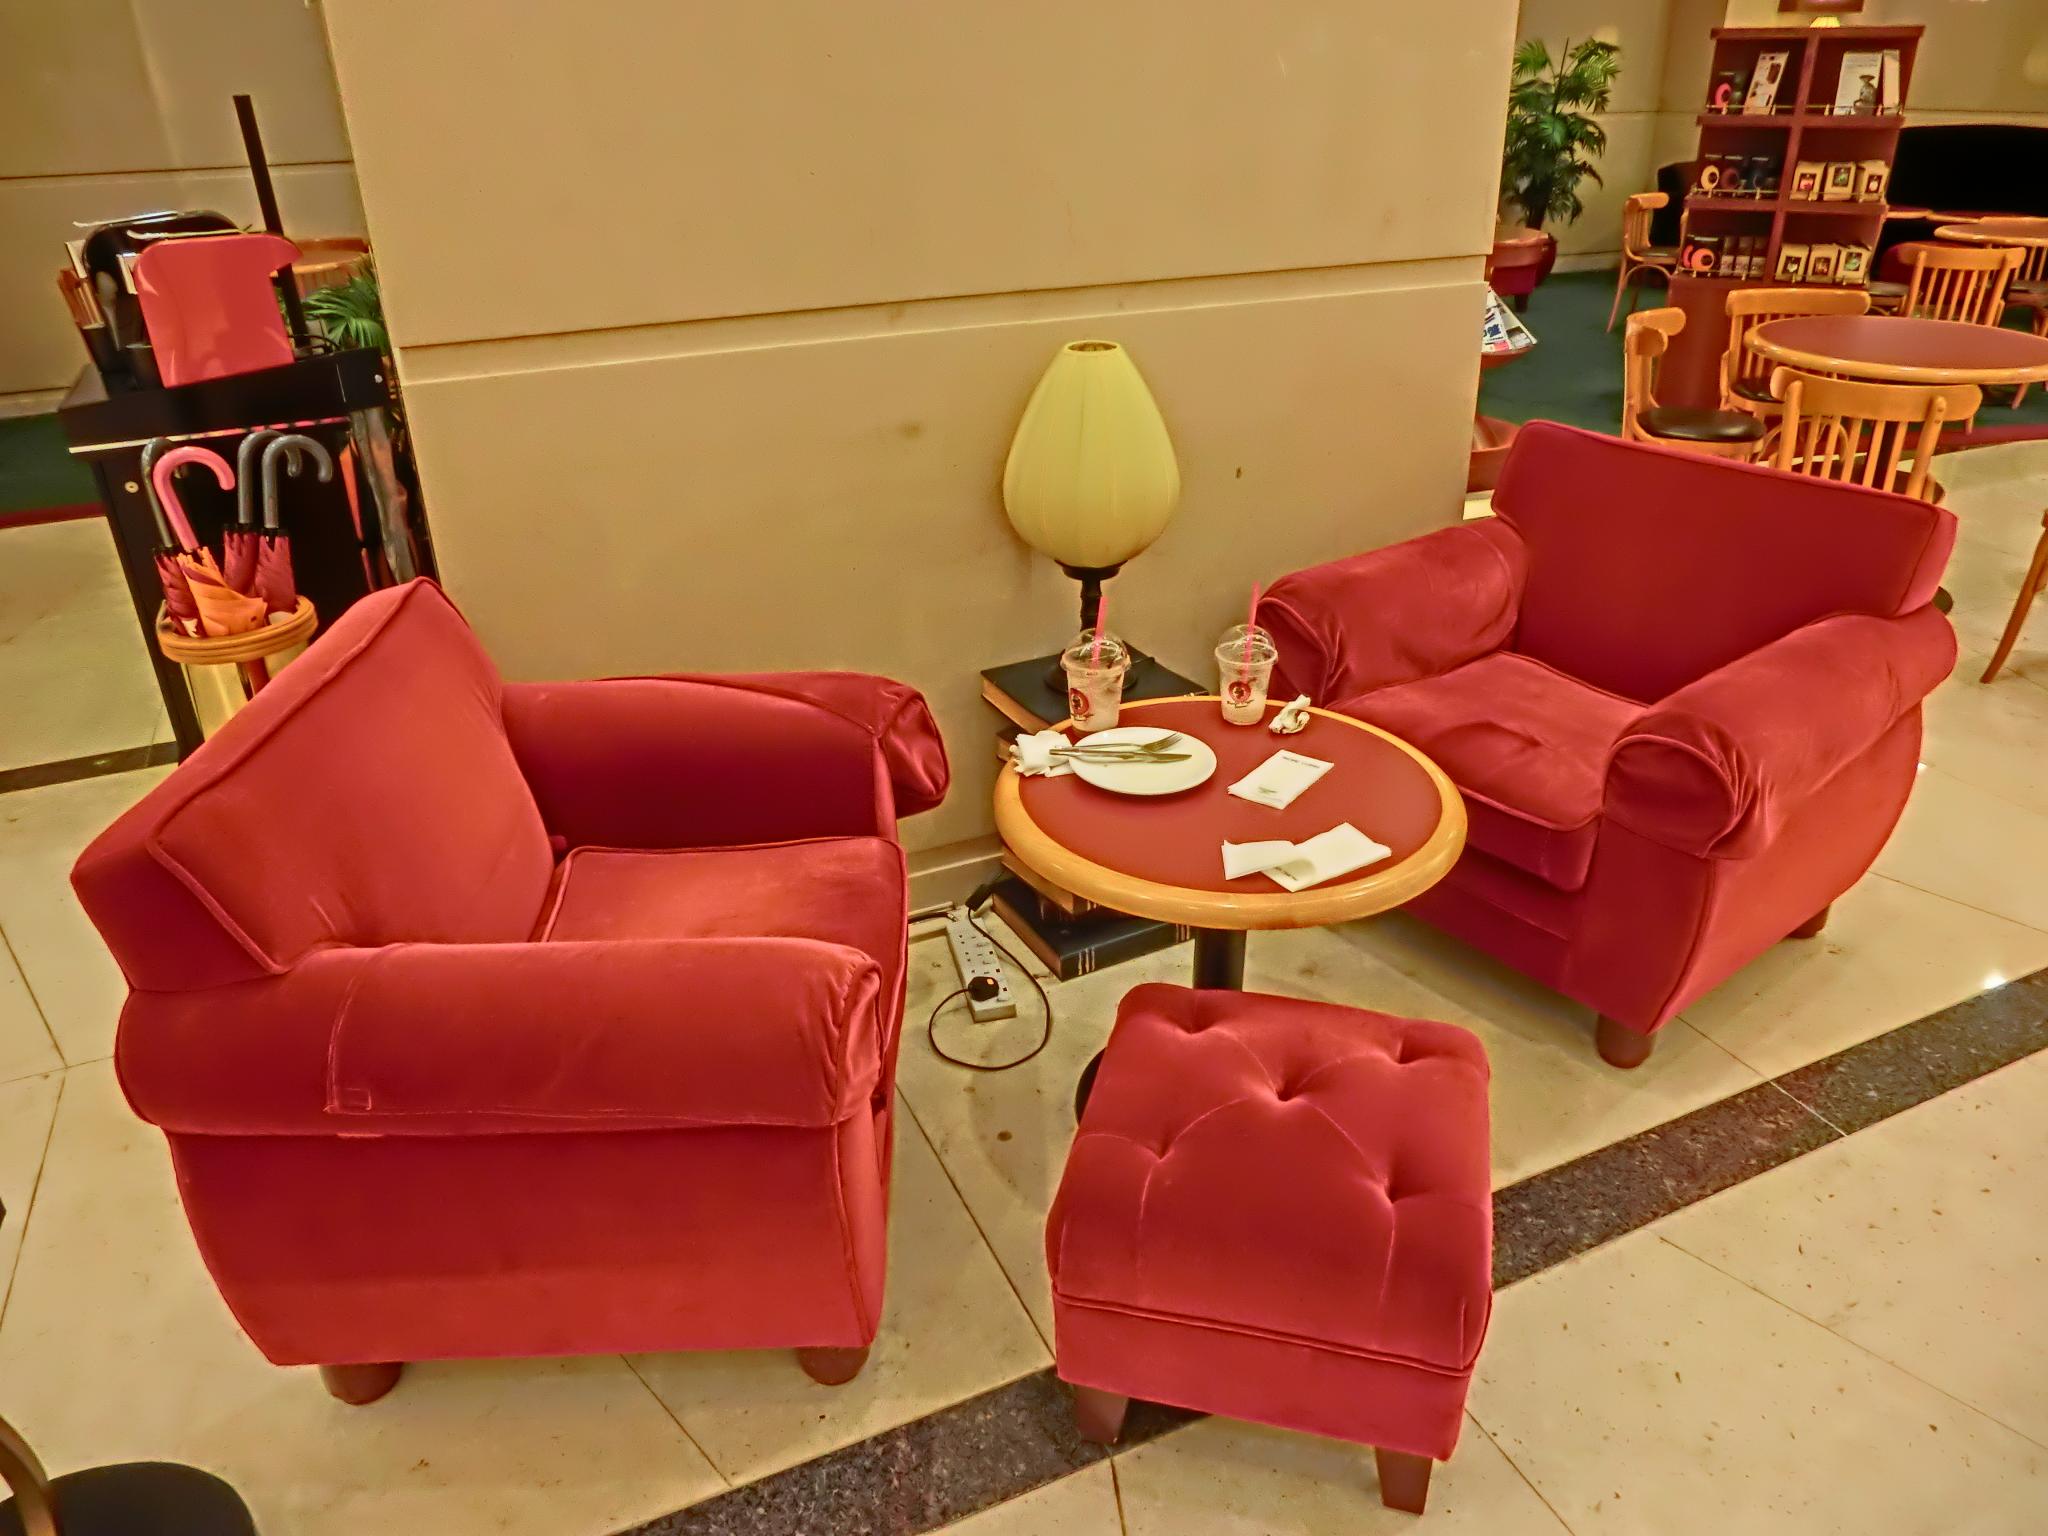 red sofa cafe baku low modular file hk 觀塘道 392 kwun tong road 創紀之城六期 millennium city 6